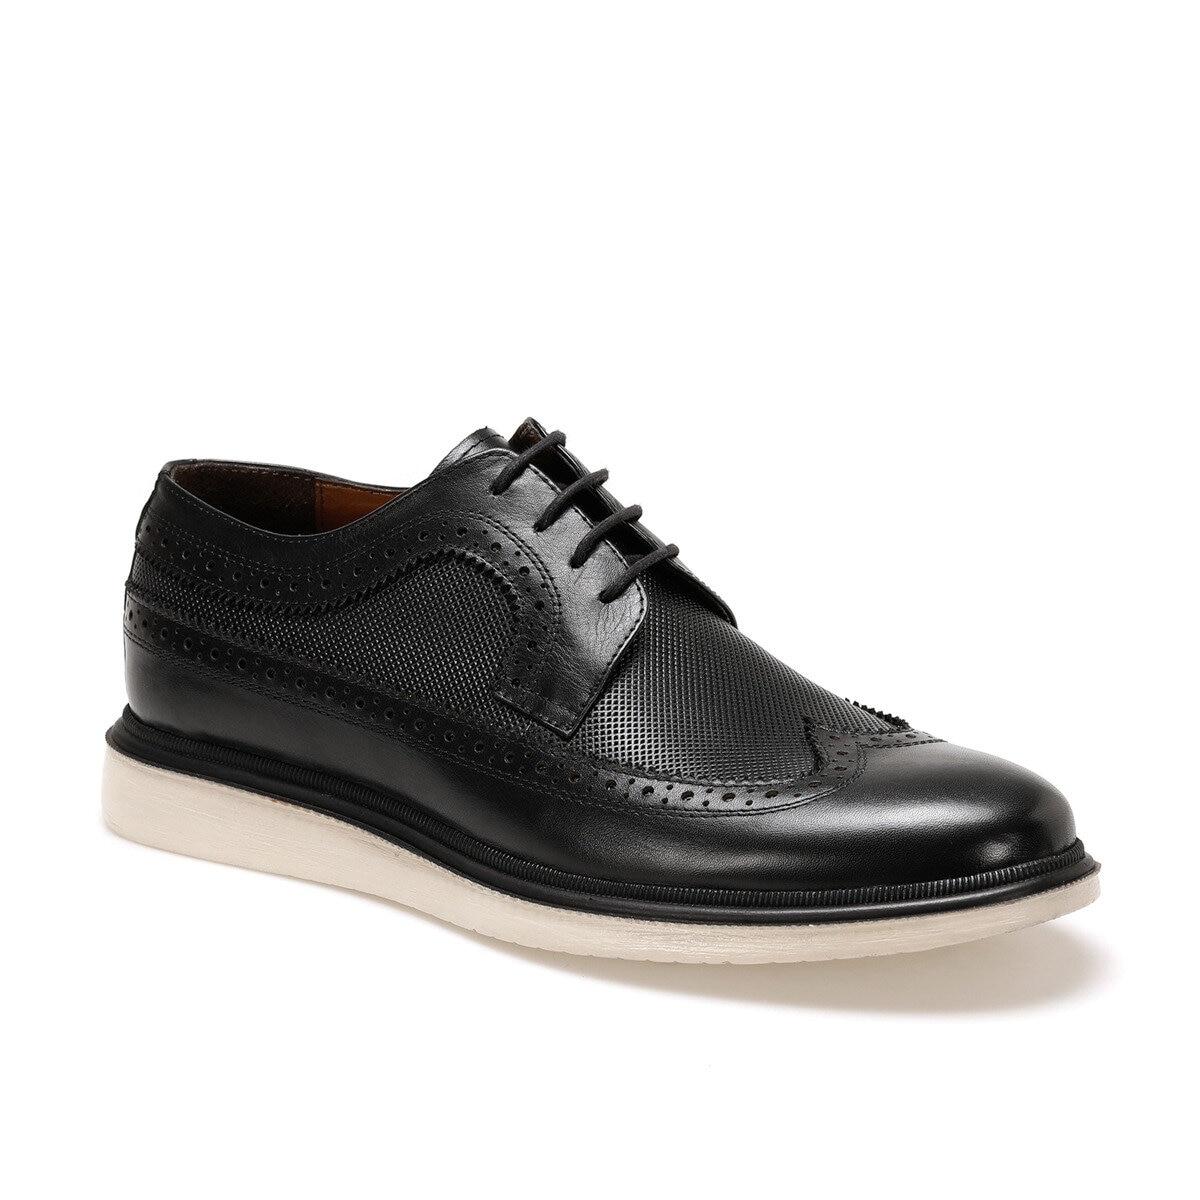 FLO 4229 Black Men Dress Shoes Garamond